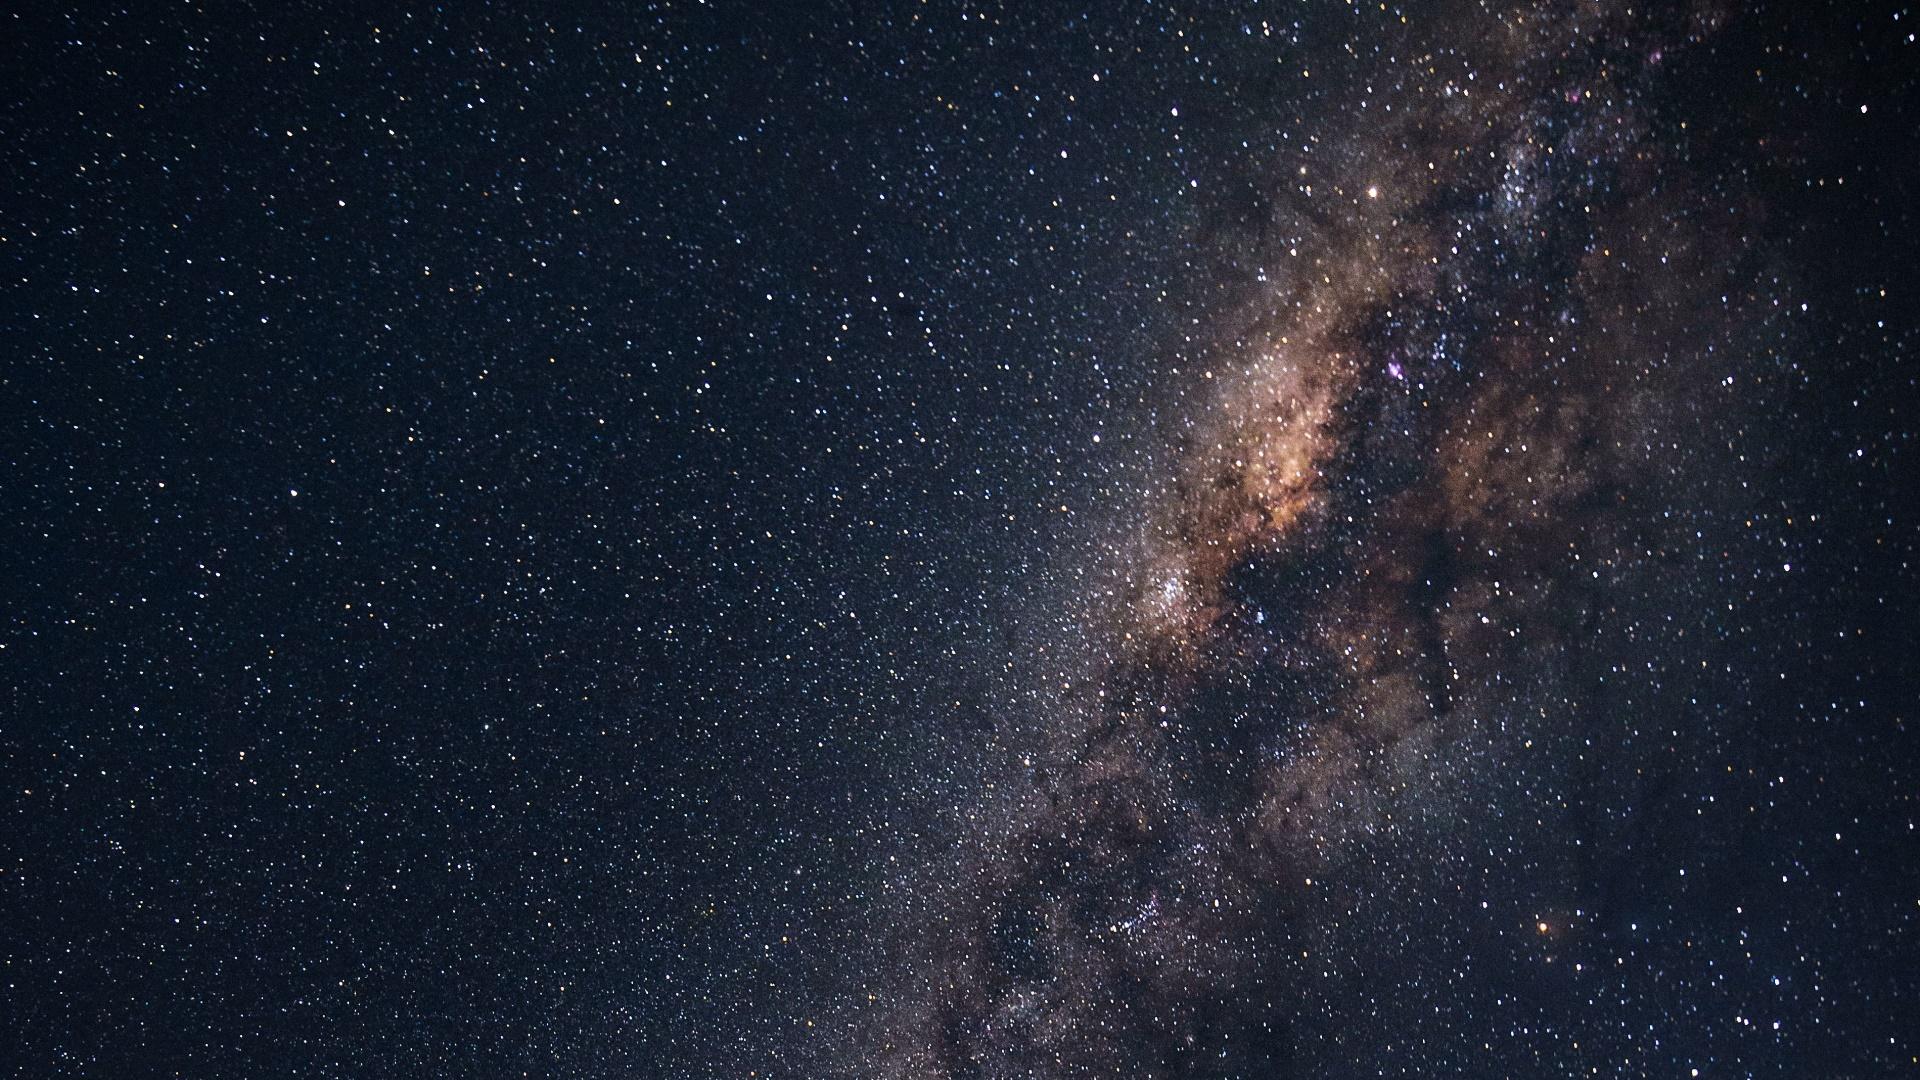 Sky and stars wallpaper